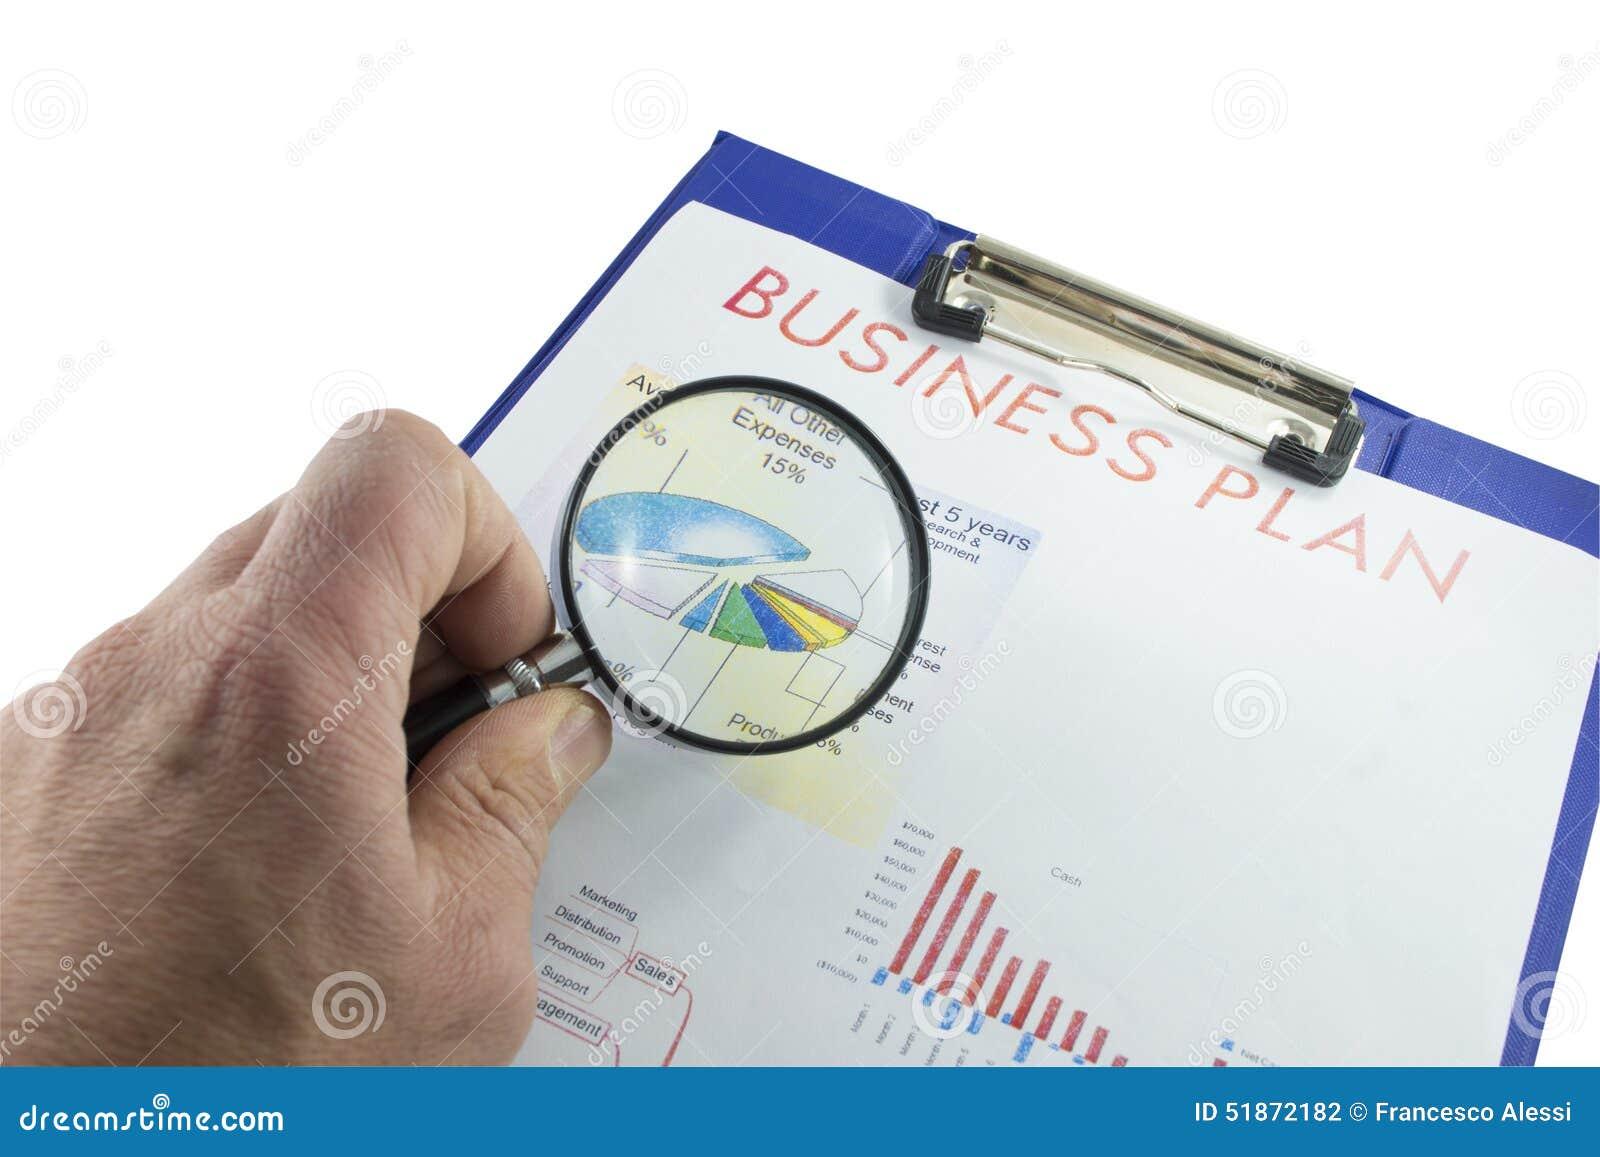 Start a Laser Engraving Business